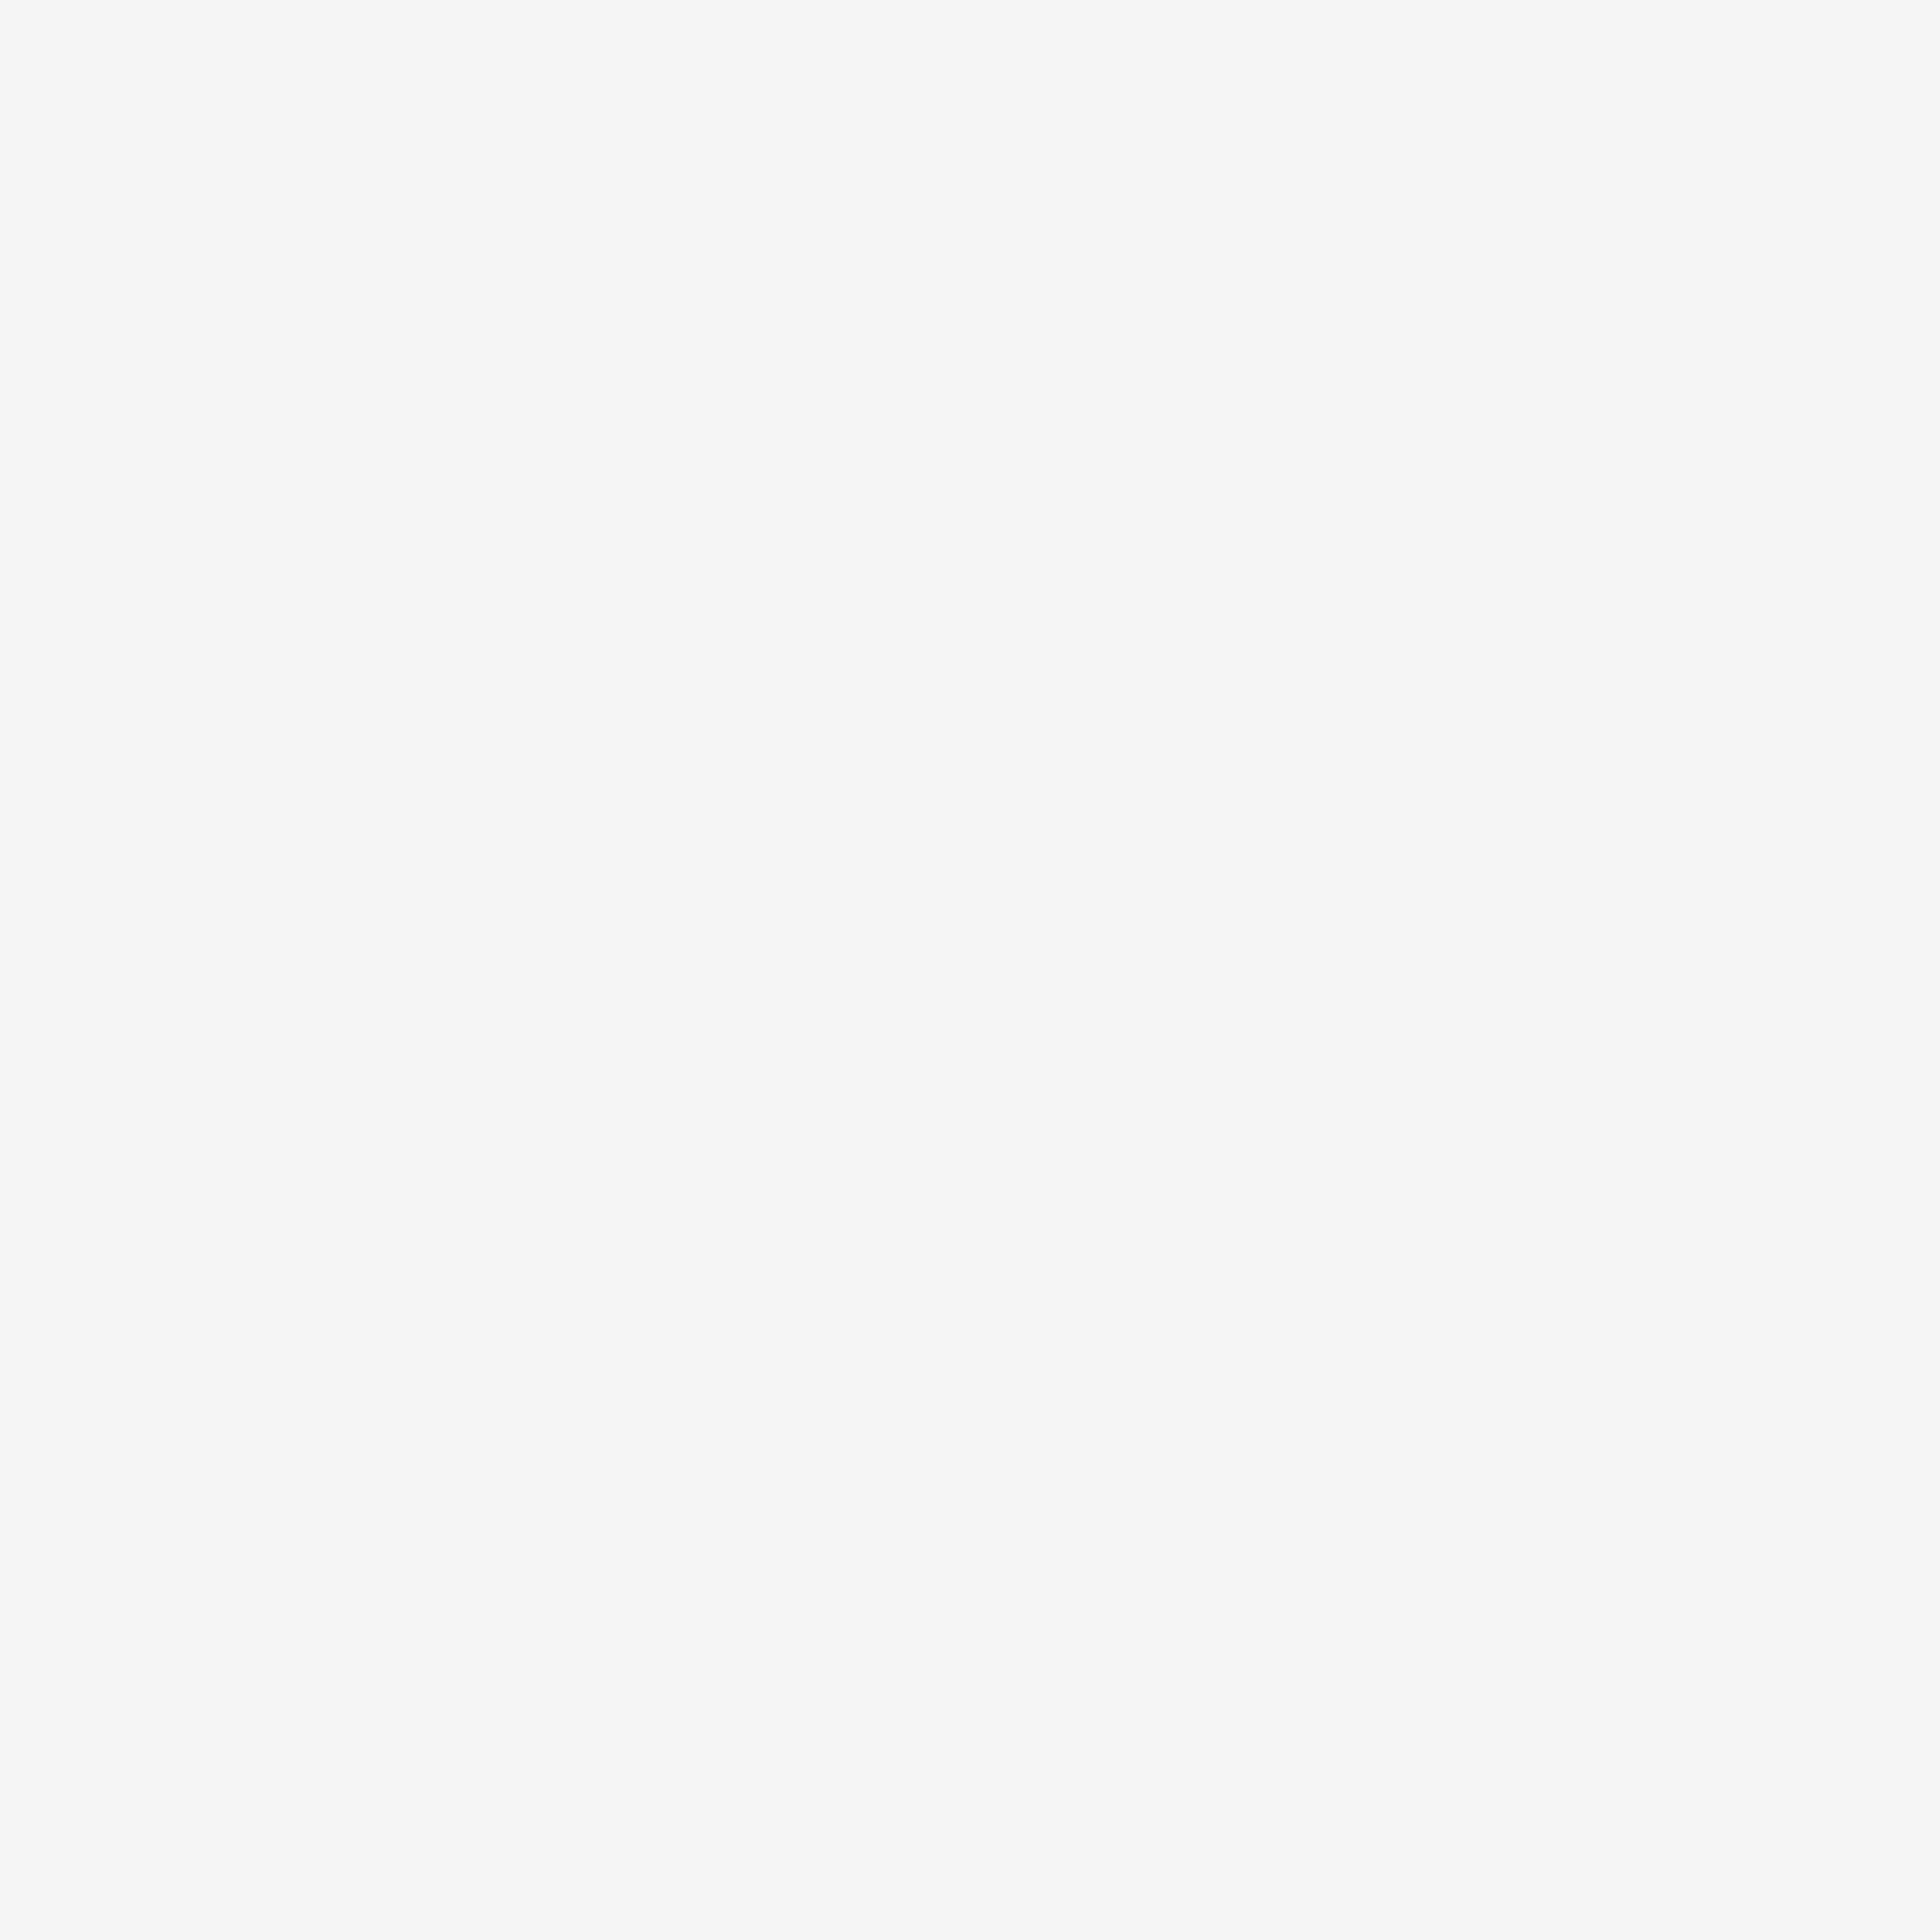 NIKE Sportswear club fleece trui groen heren Heren